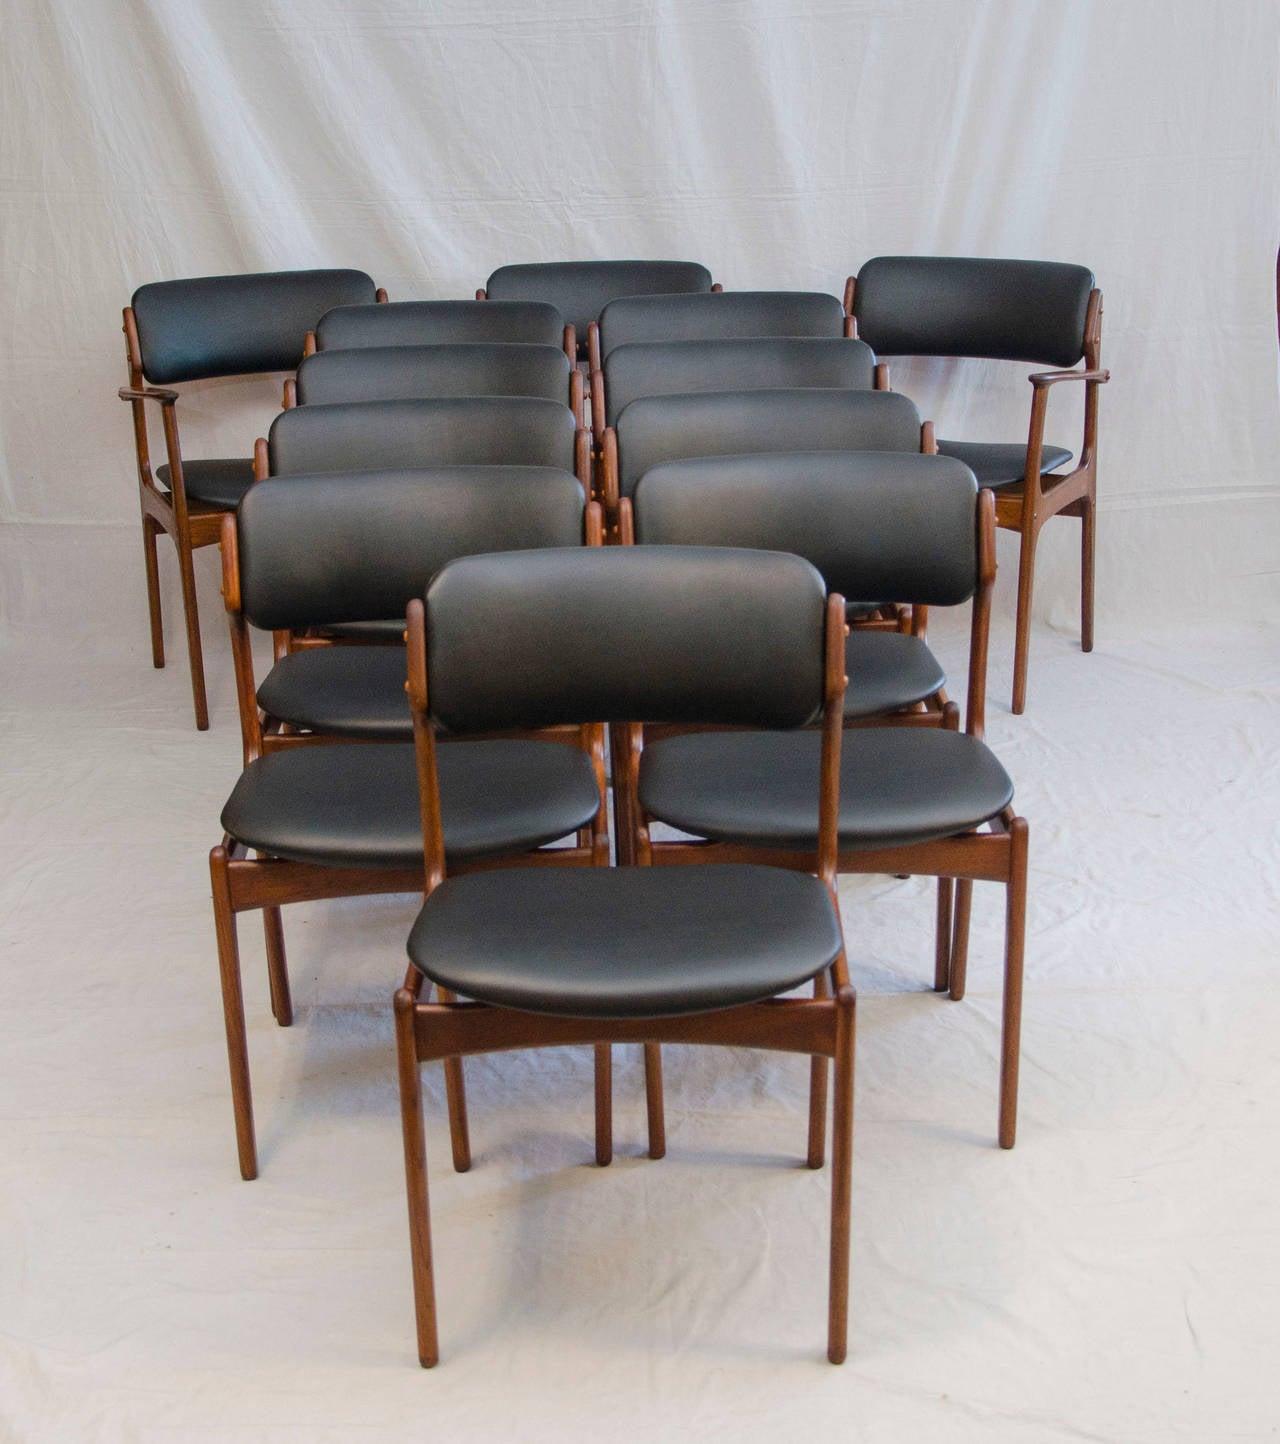 erik buck chairs wheelchair left set of 12 danish teak dining by at 1stdibs